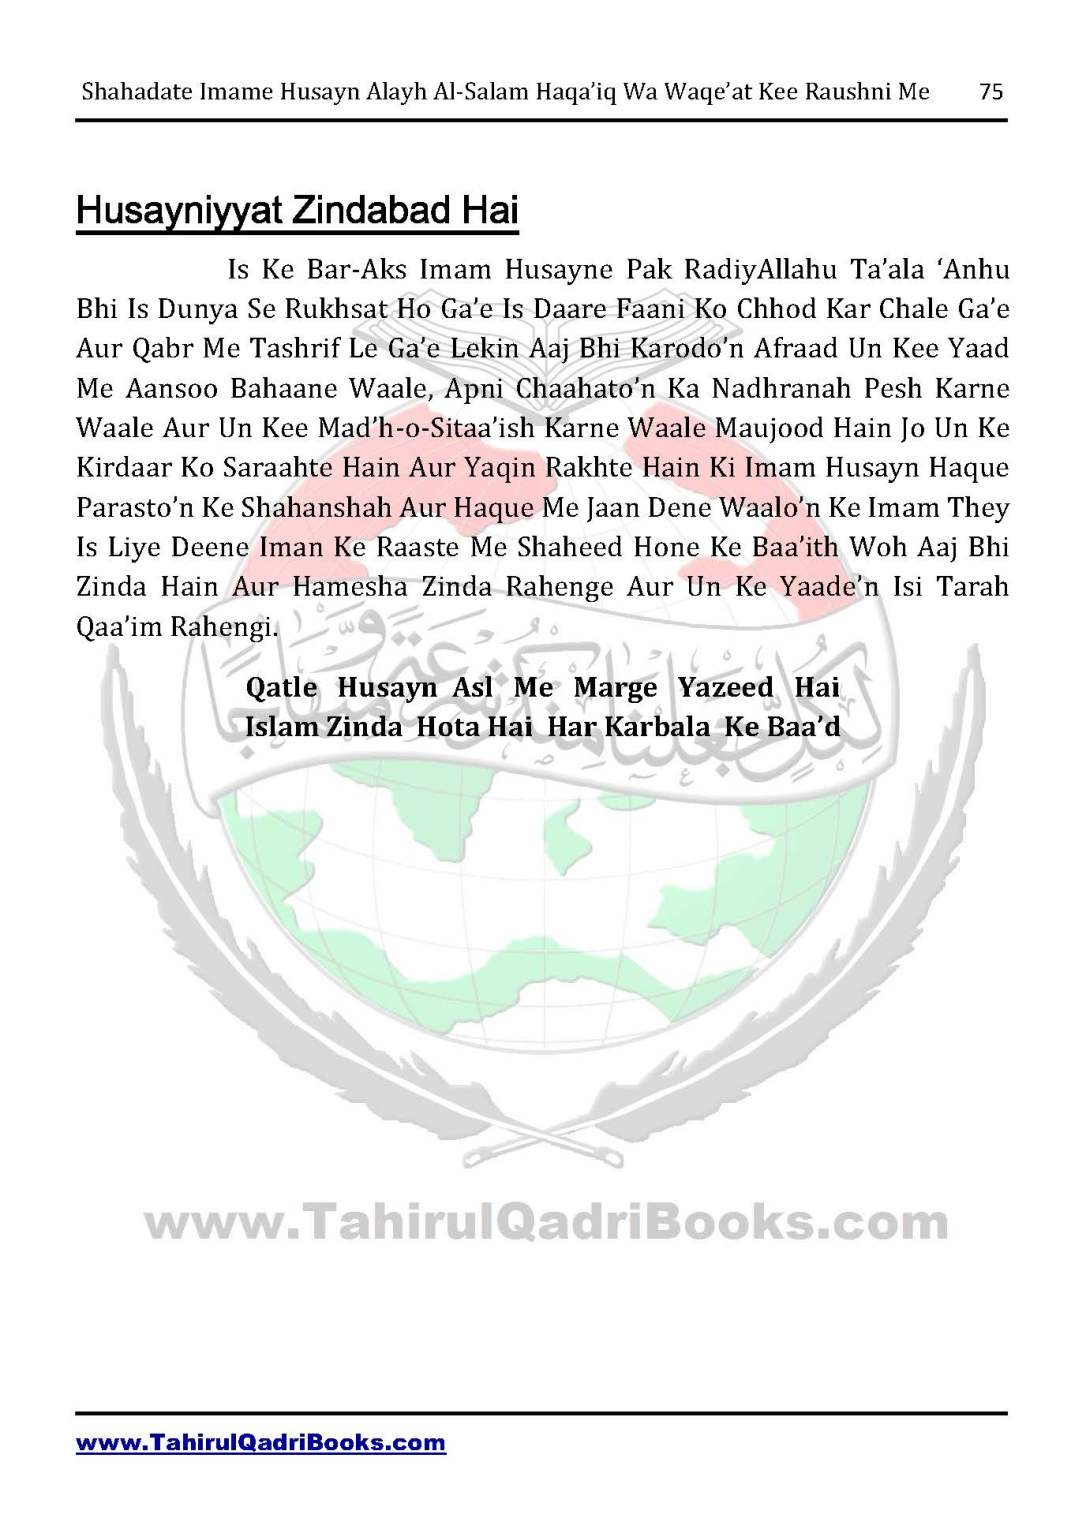 shahadate-imame-husayn-alayh-is-salam-haqaiq-wa-waqe_at-kee-raushni-me-in-roman-urdu-unlocked_Page_75